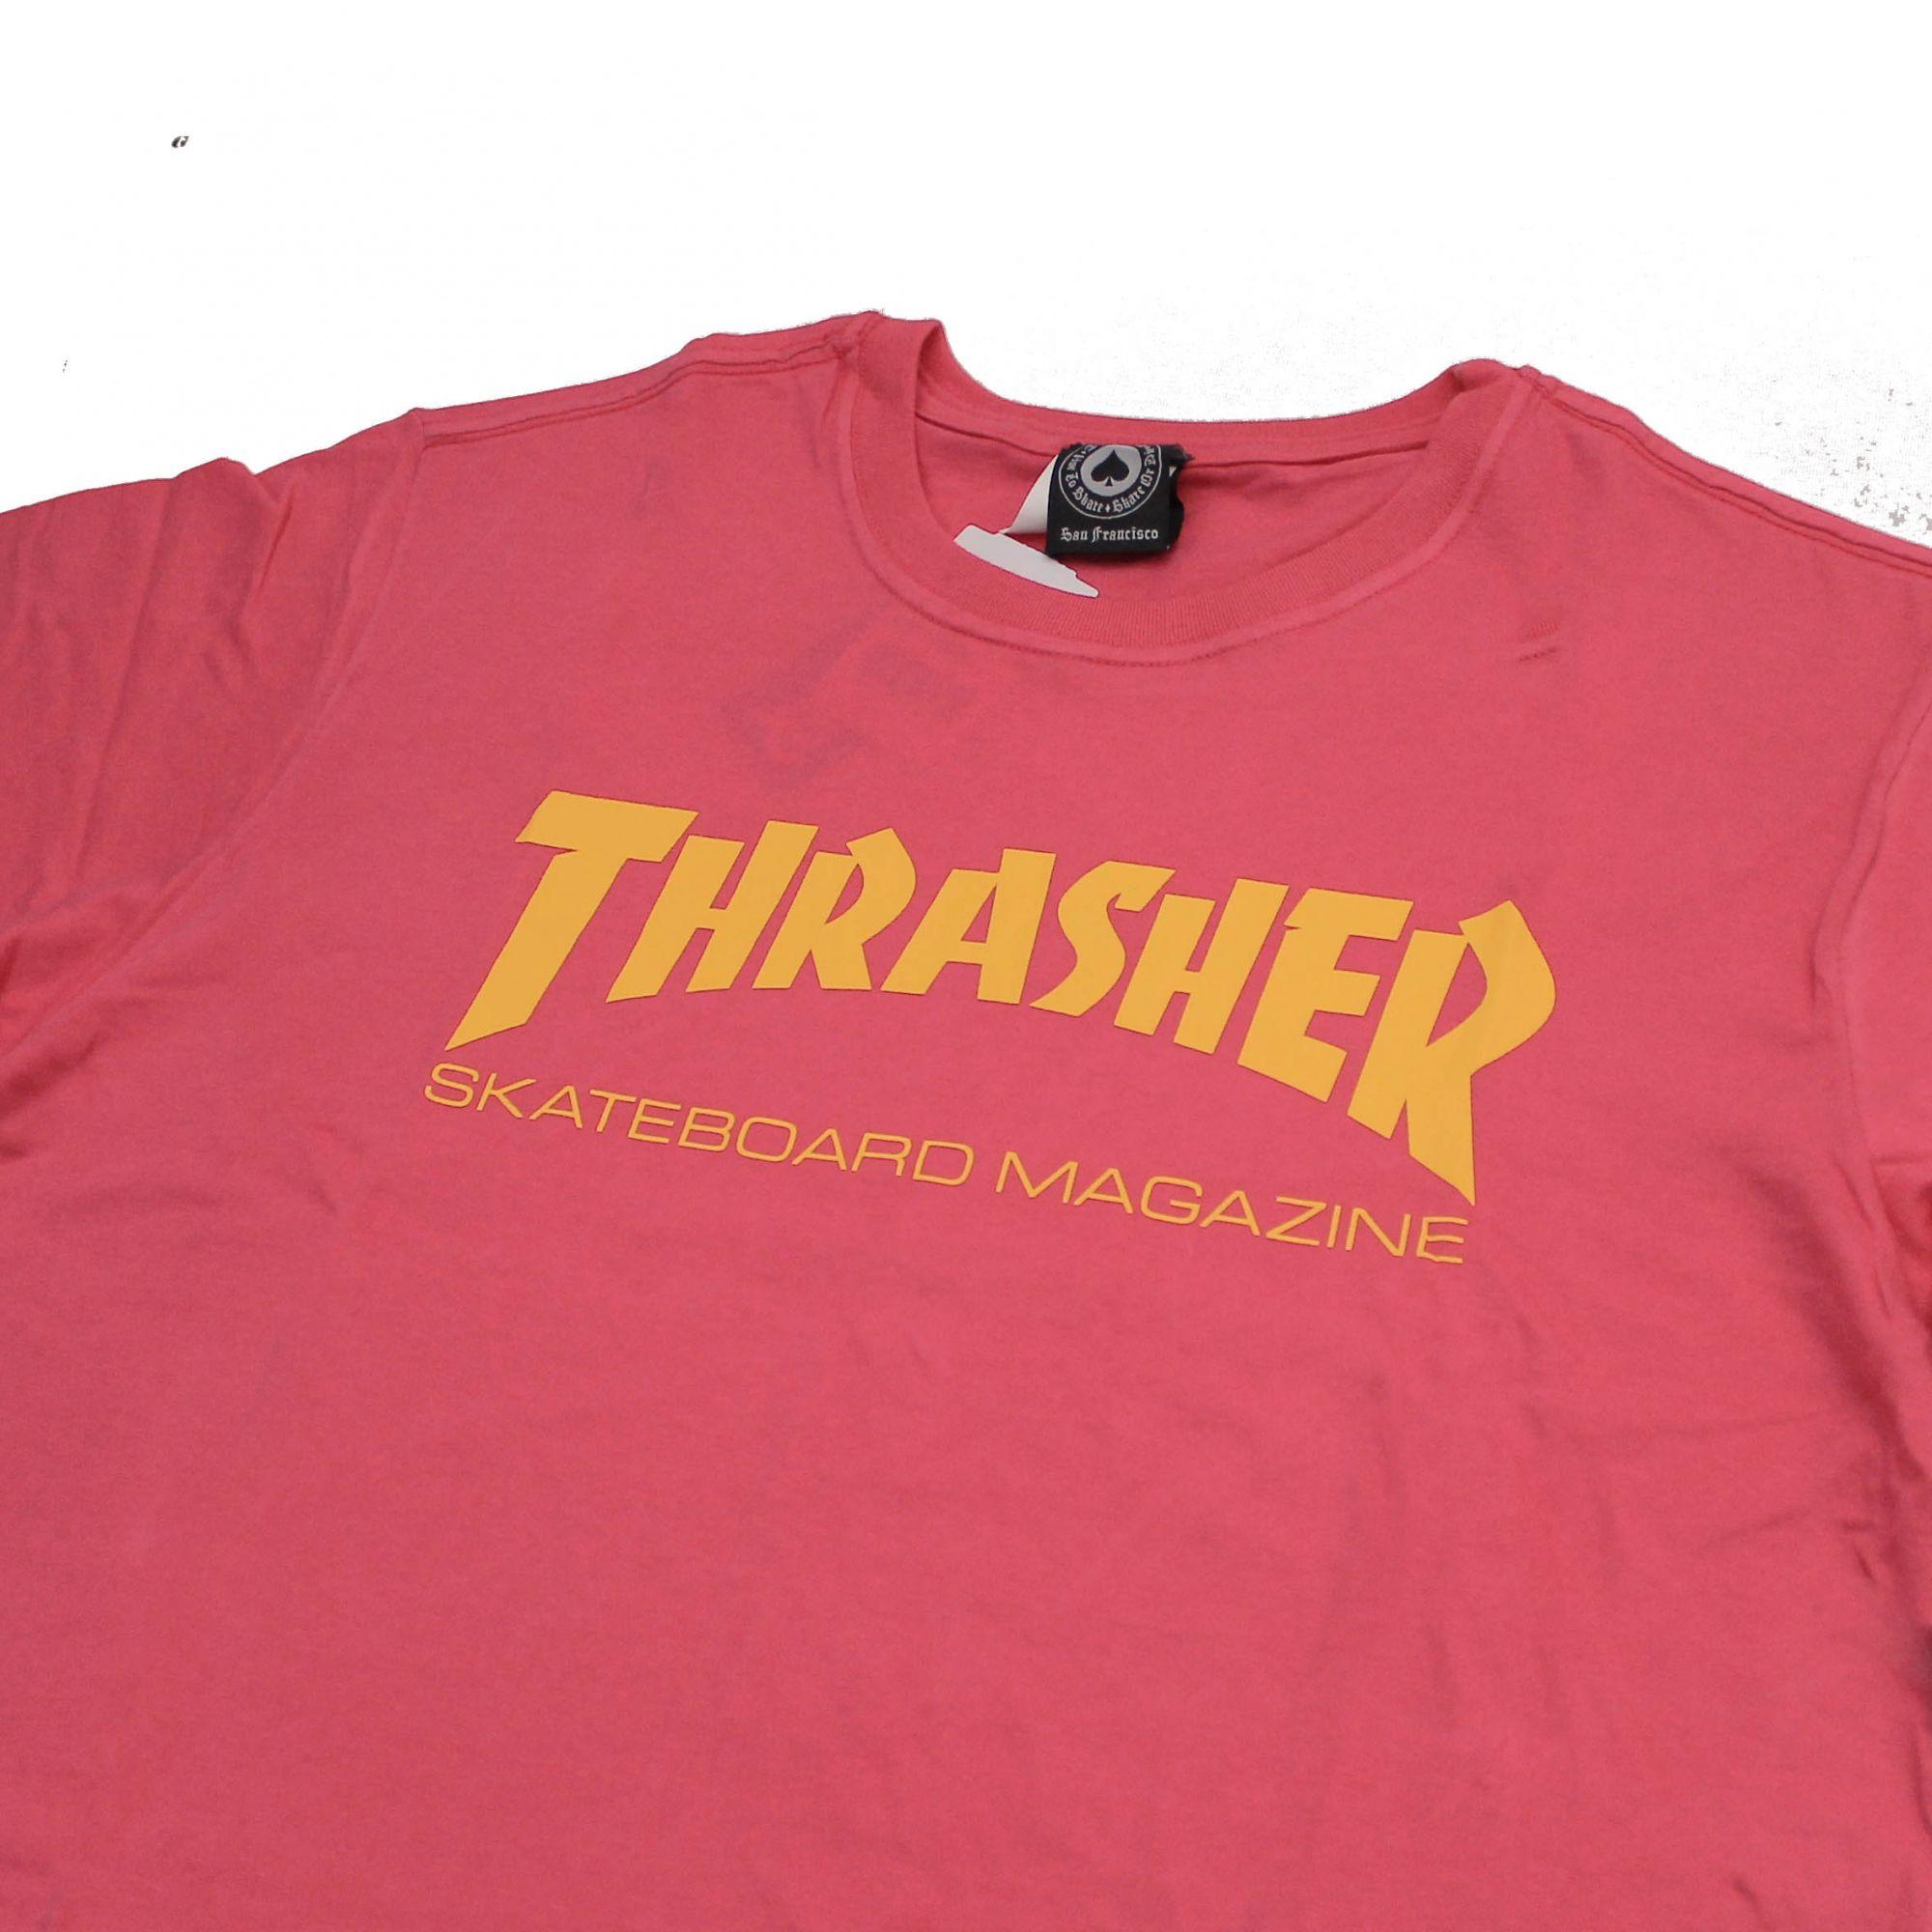 Camiseta Thrasher Magazine Skate Mag Rosa Pink